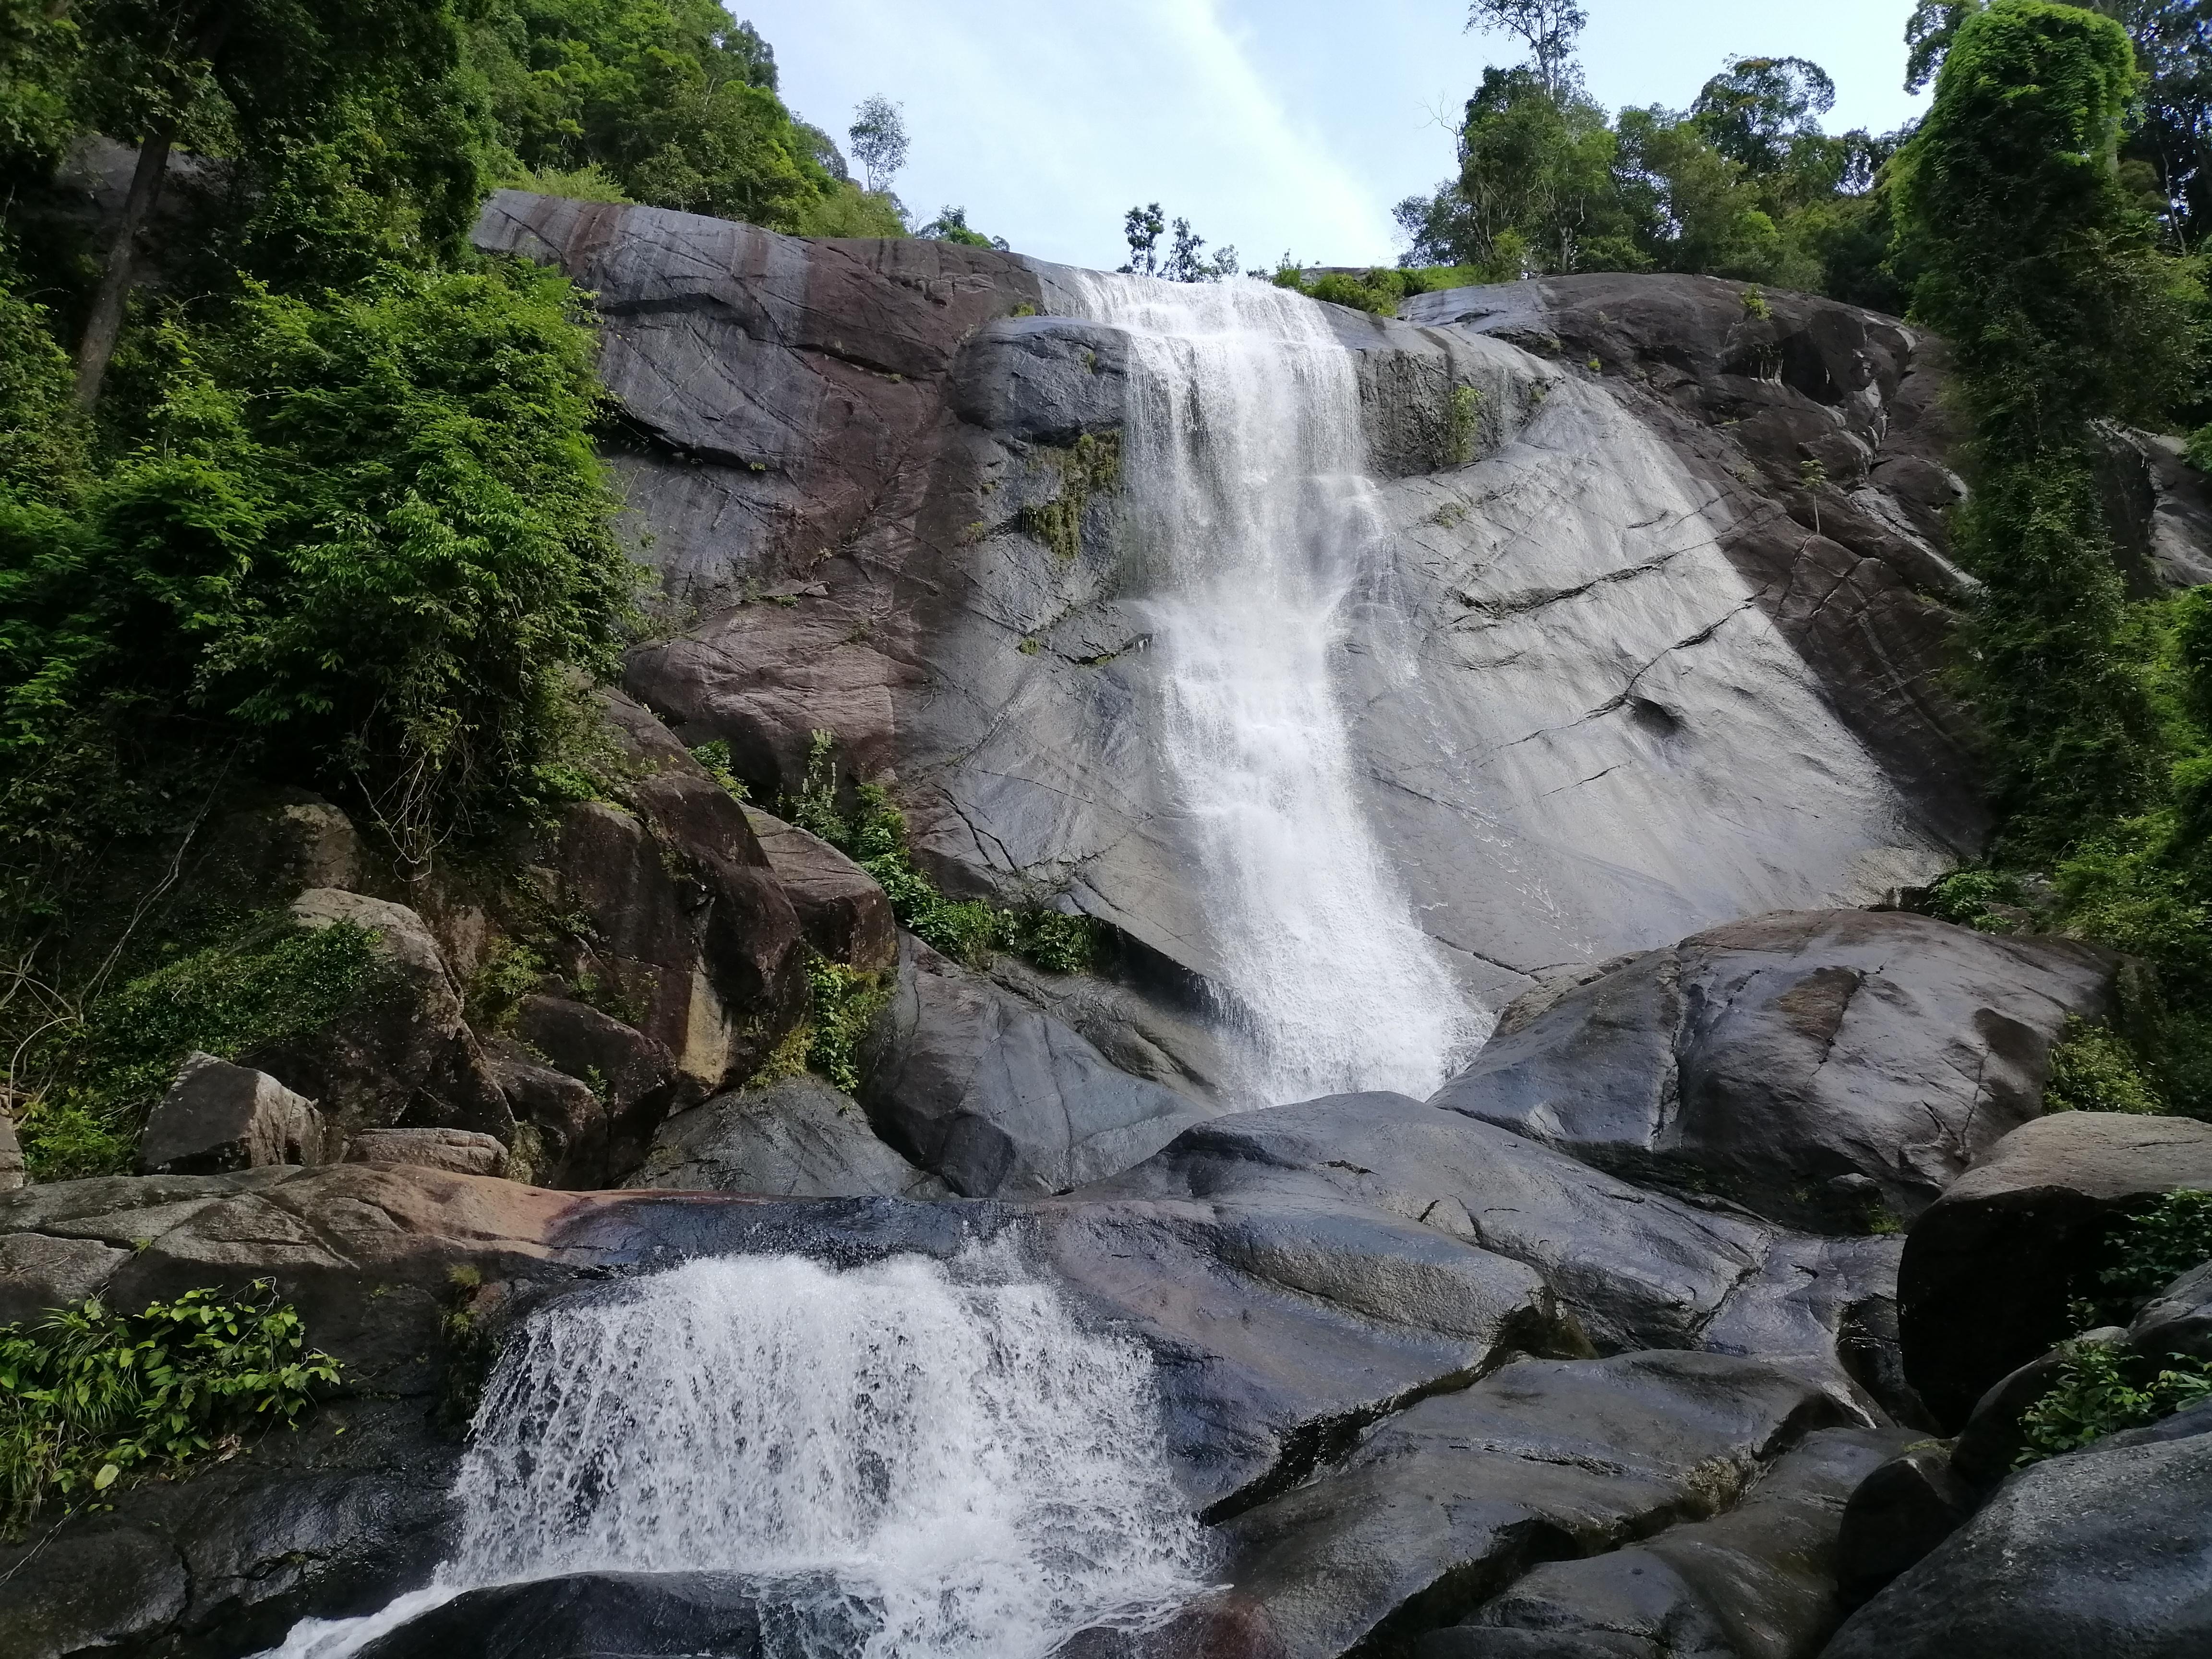 Telaga Tujuh Waterfalls - a popular tourist attraction in Langkawi